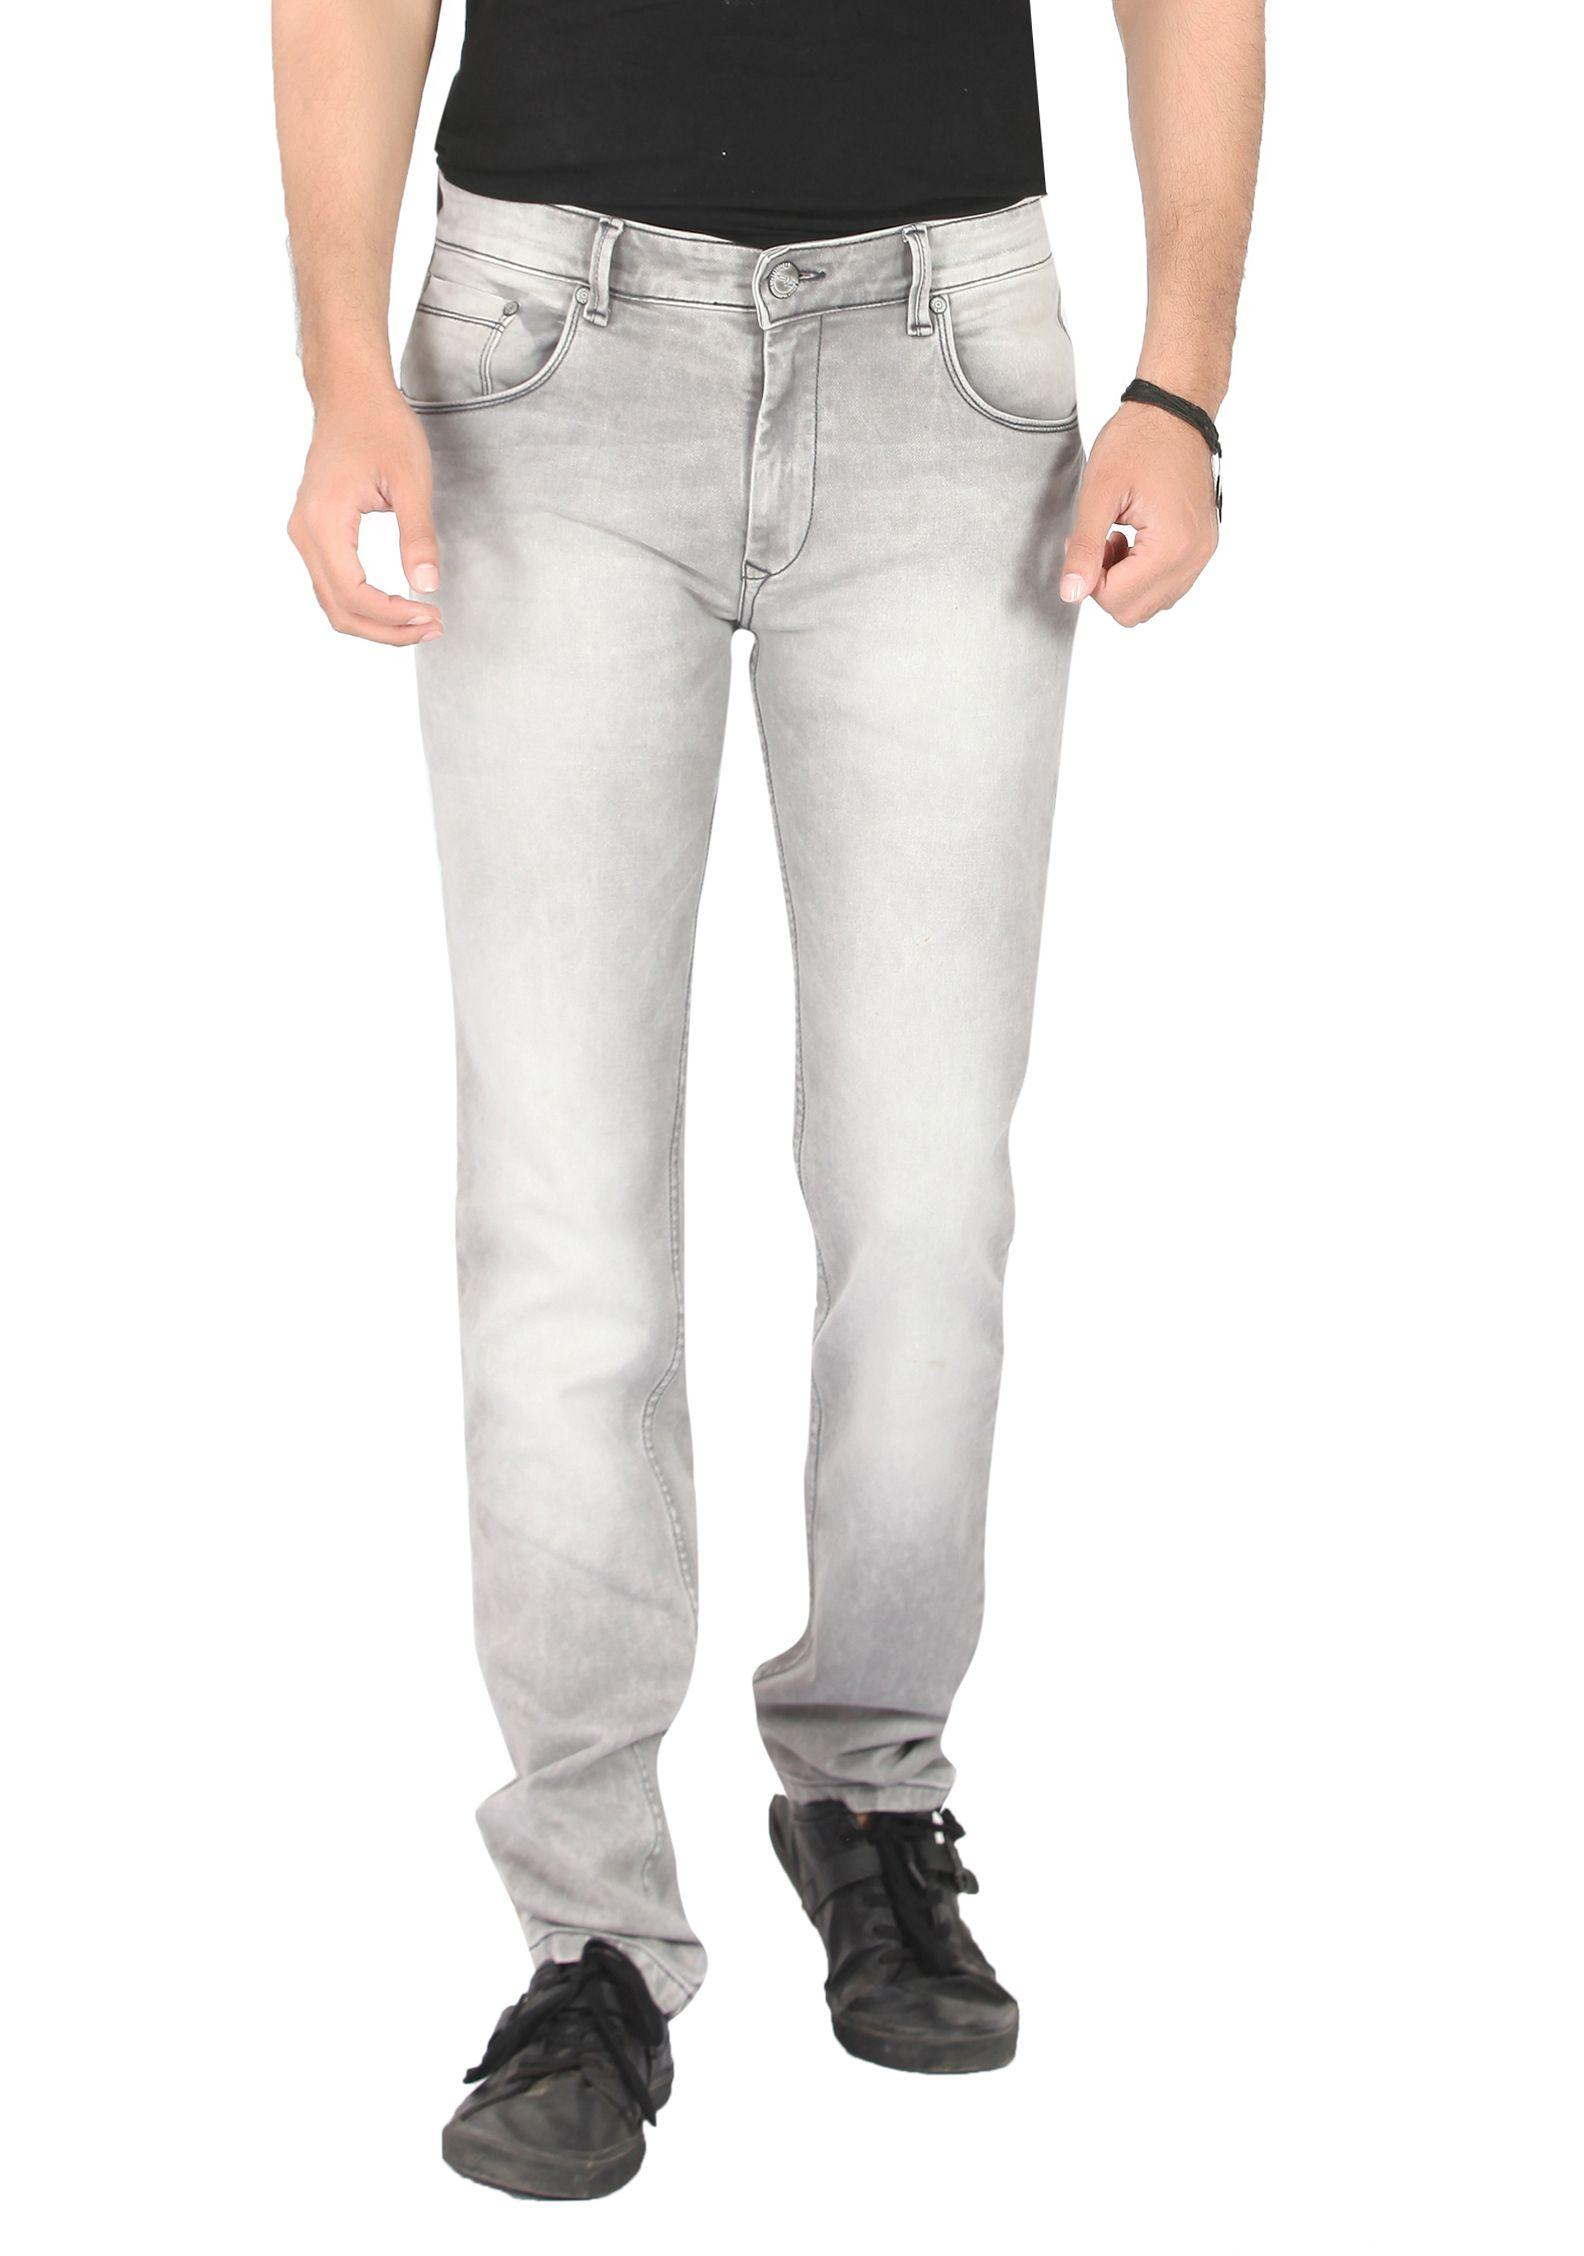 Pecos Bill Grey Slim Jeans